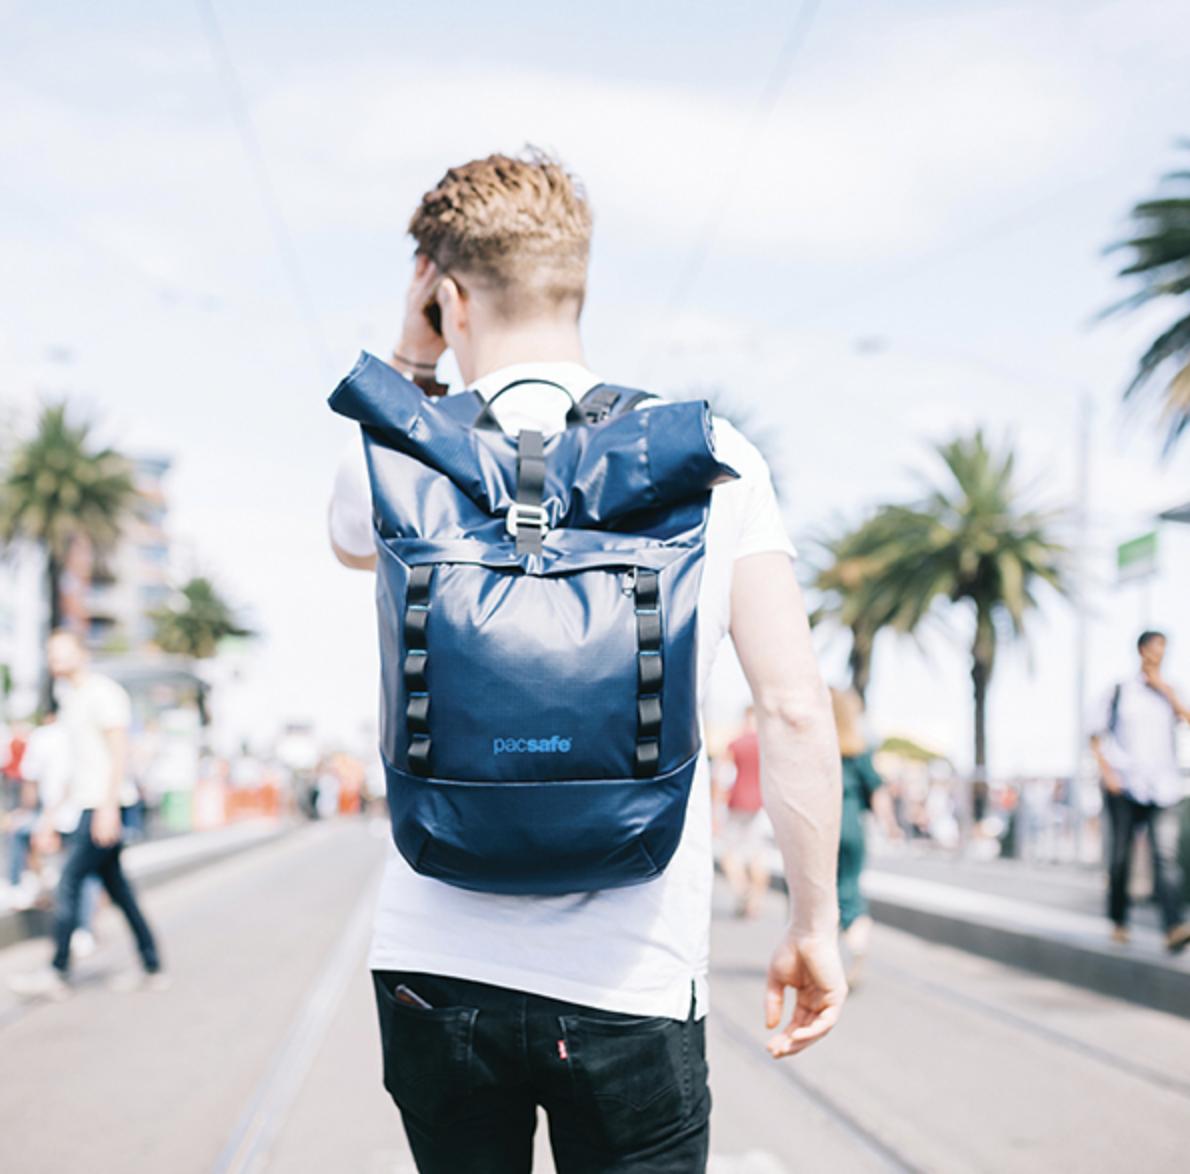 f:id:thebackpack:20190818095247p:plain